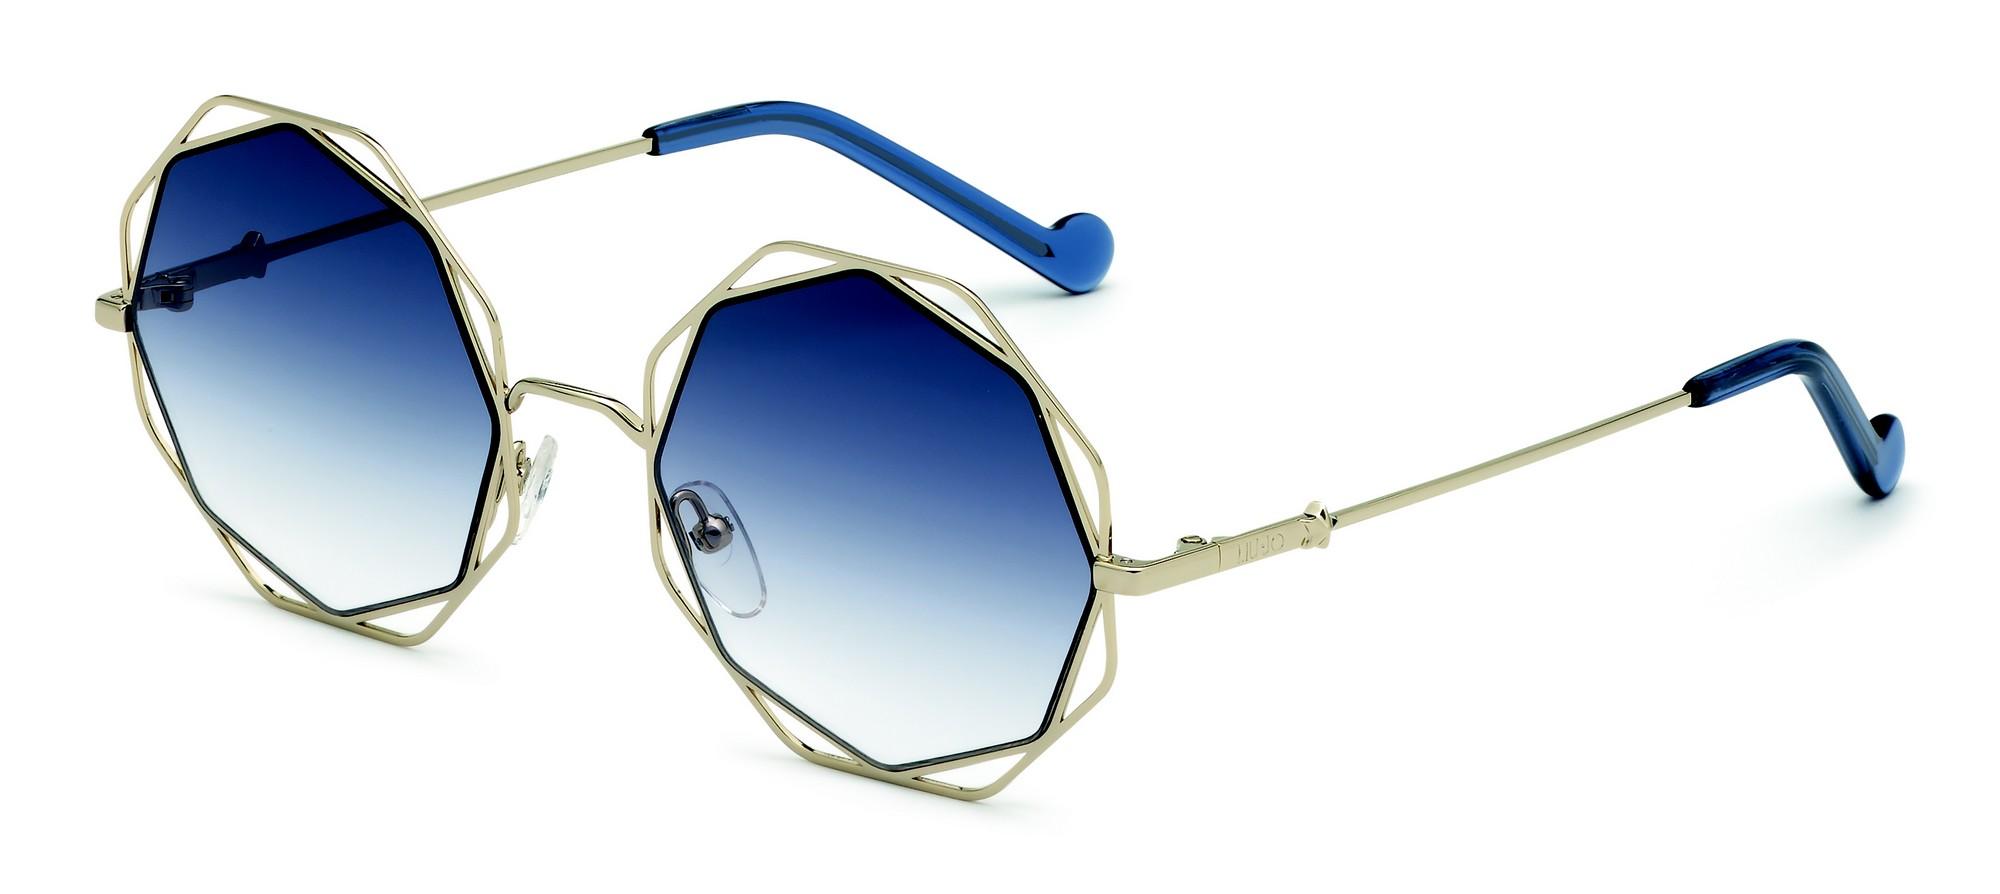 liu-jo-eyewear-ss20-lj128s_754_a.jpg